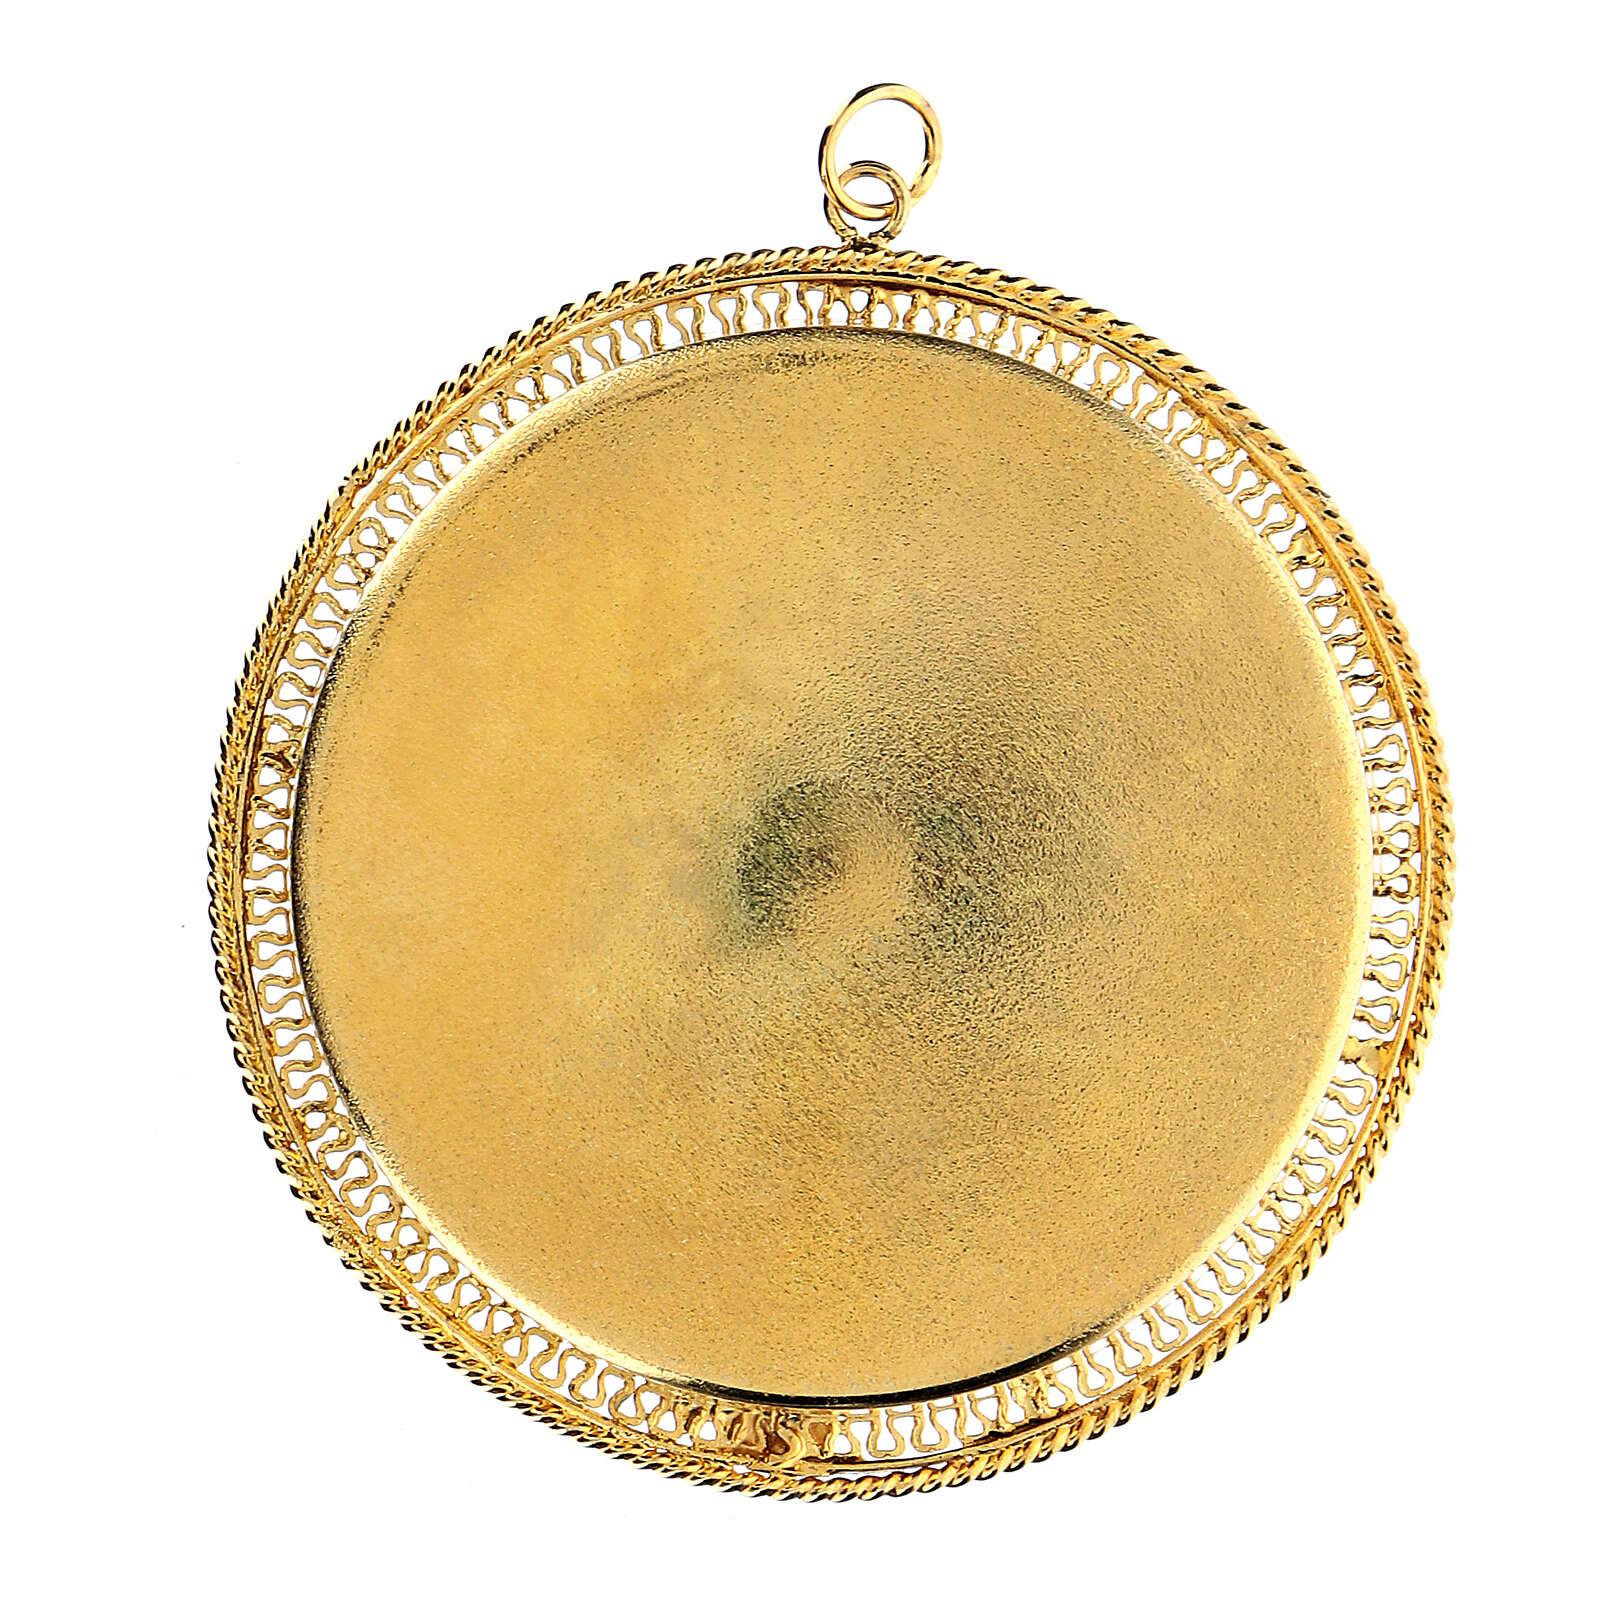 Relicario plata 925 dorada filigrana redondo 6 cm 4